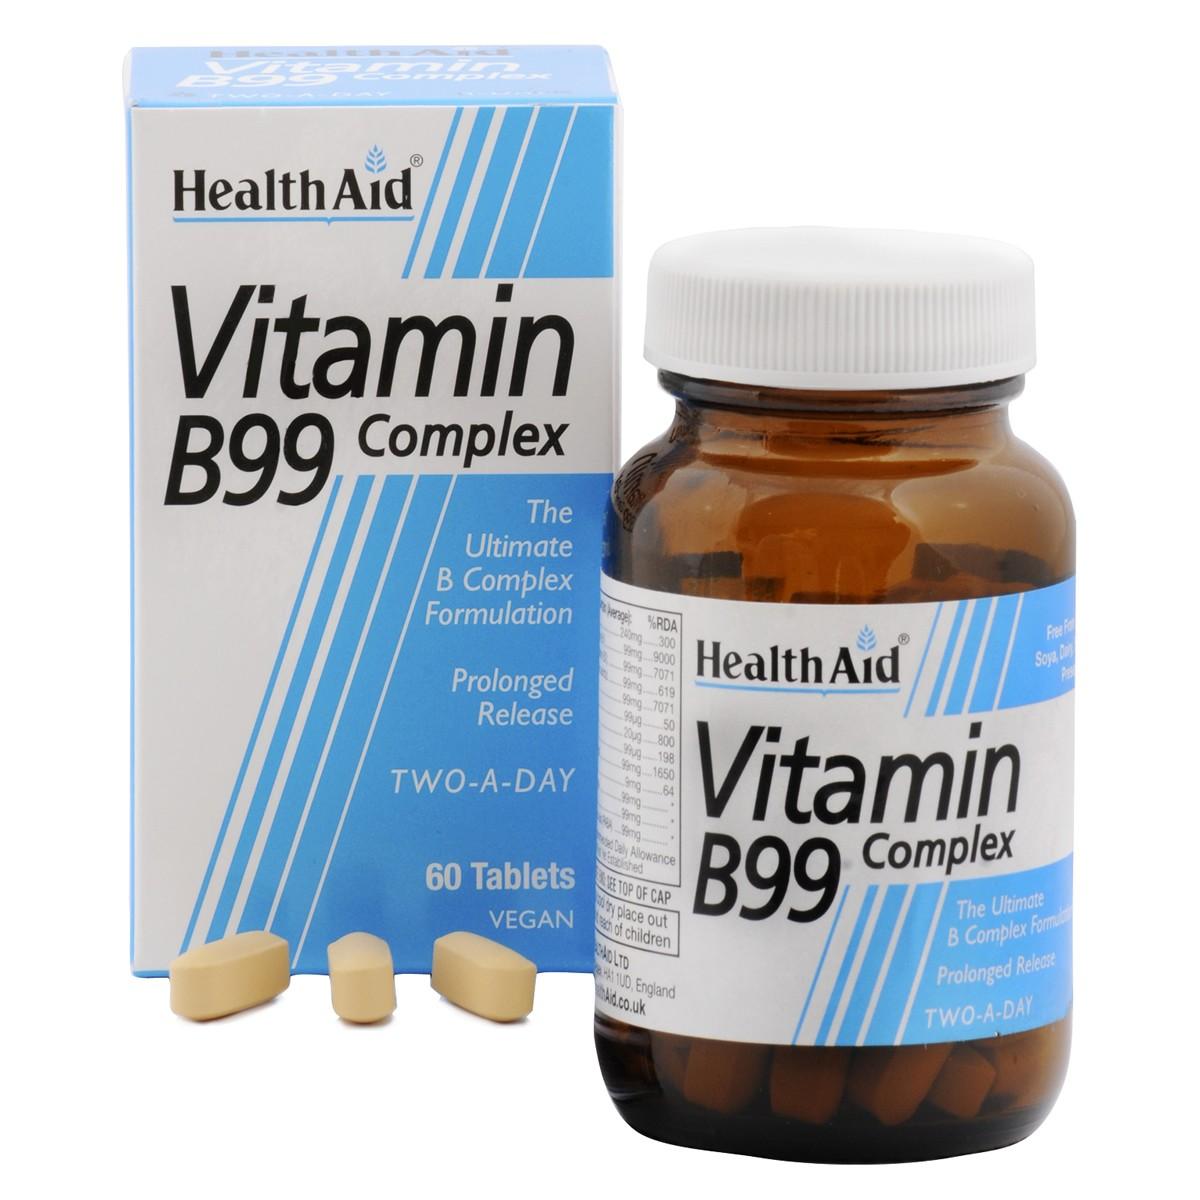 HealthAid Vitamin B99 Complex - Prolonged Release